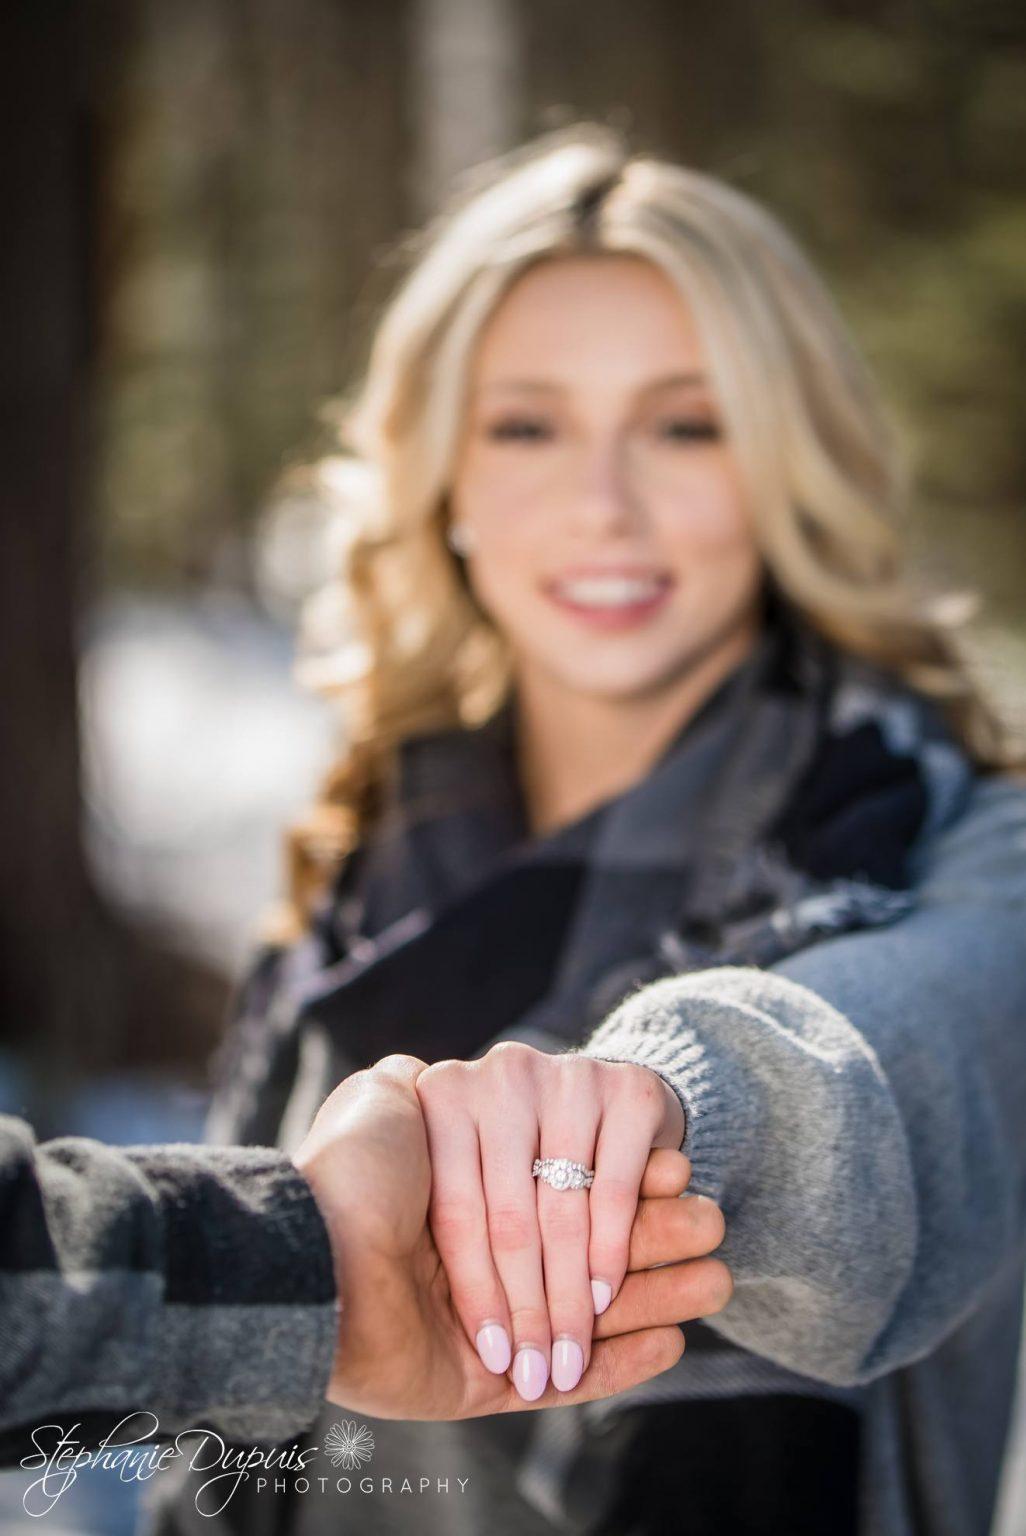 dwyer engagement 9 1026x1536 - Portfolio: Spencer & Kali's Engagement